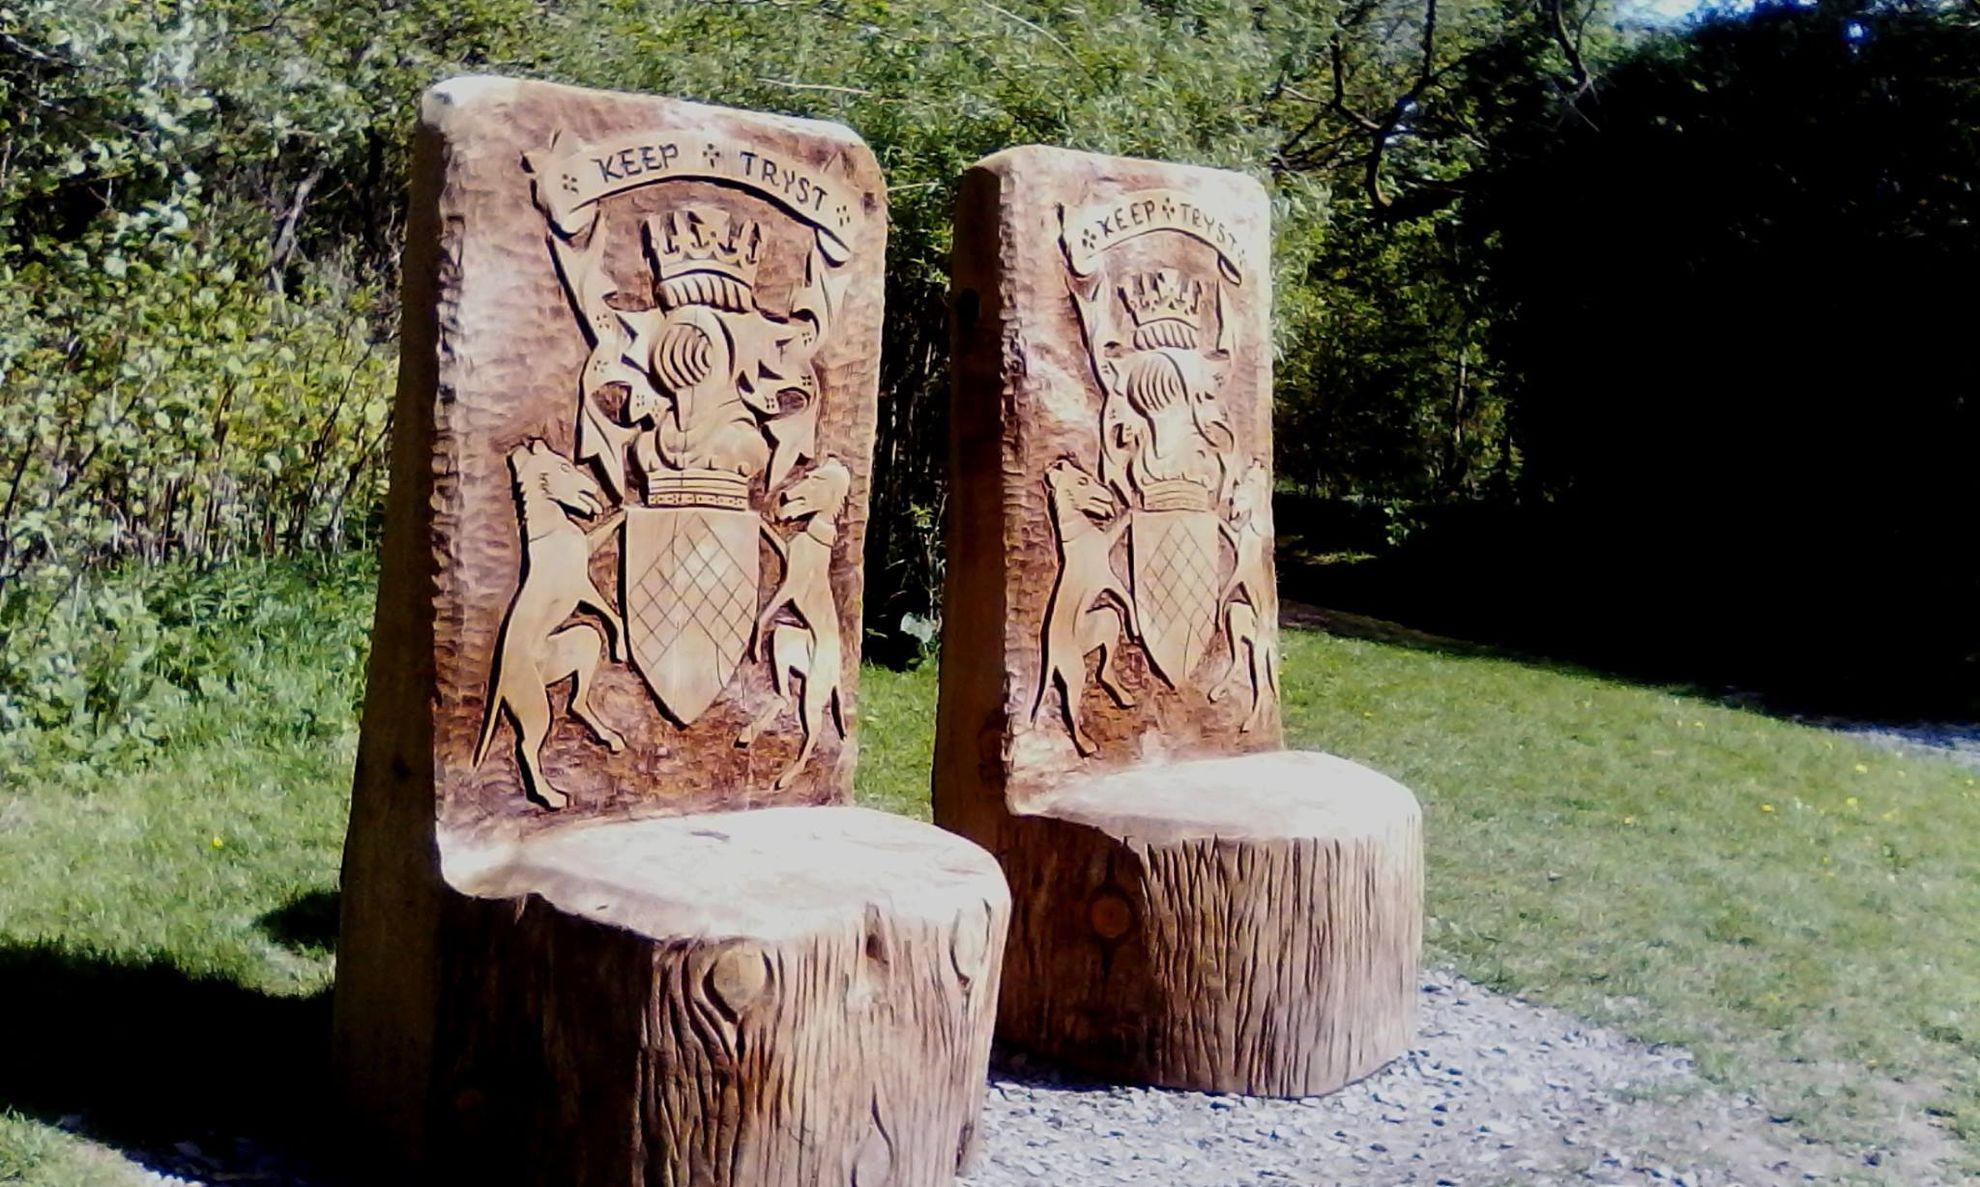 Lochwinnoch e Castle Semple Country Park